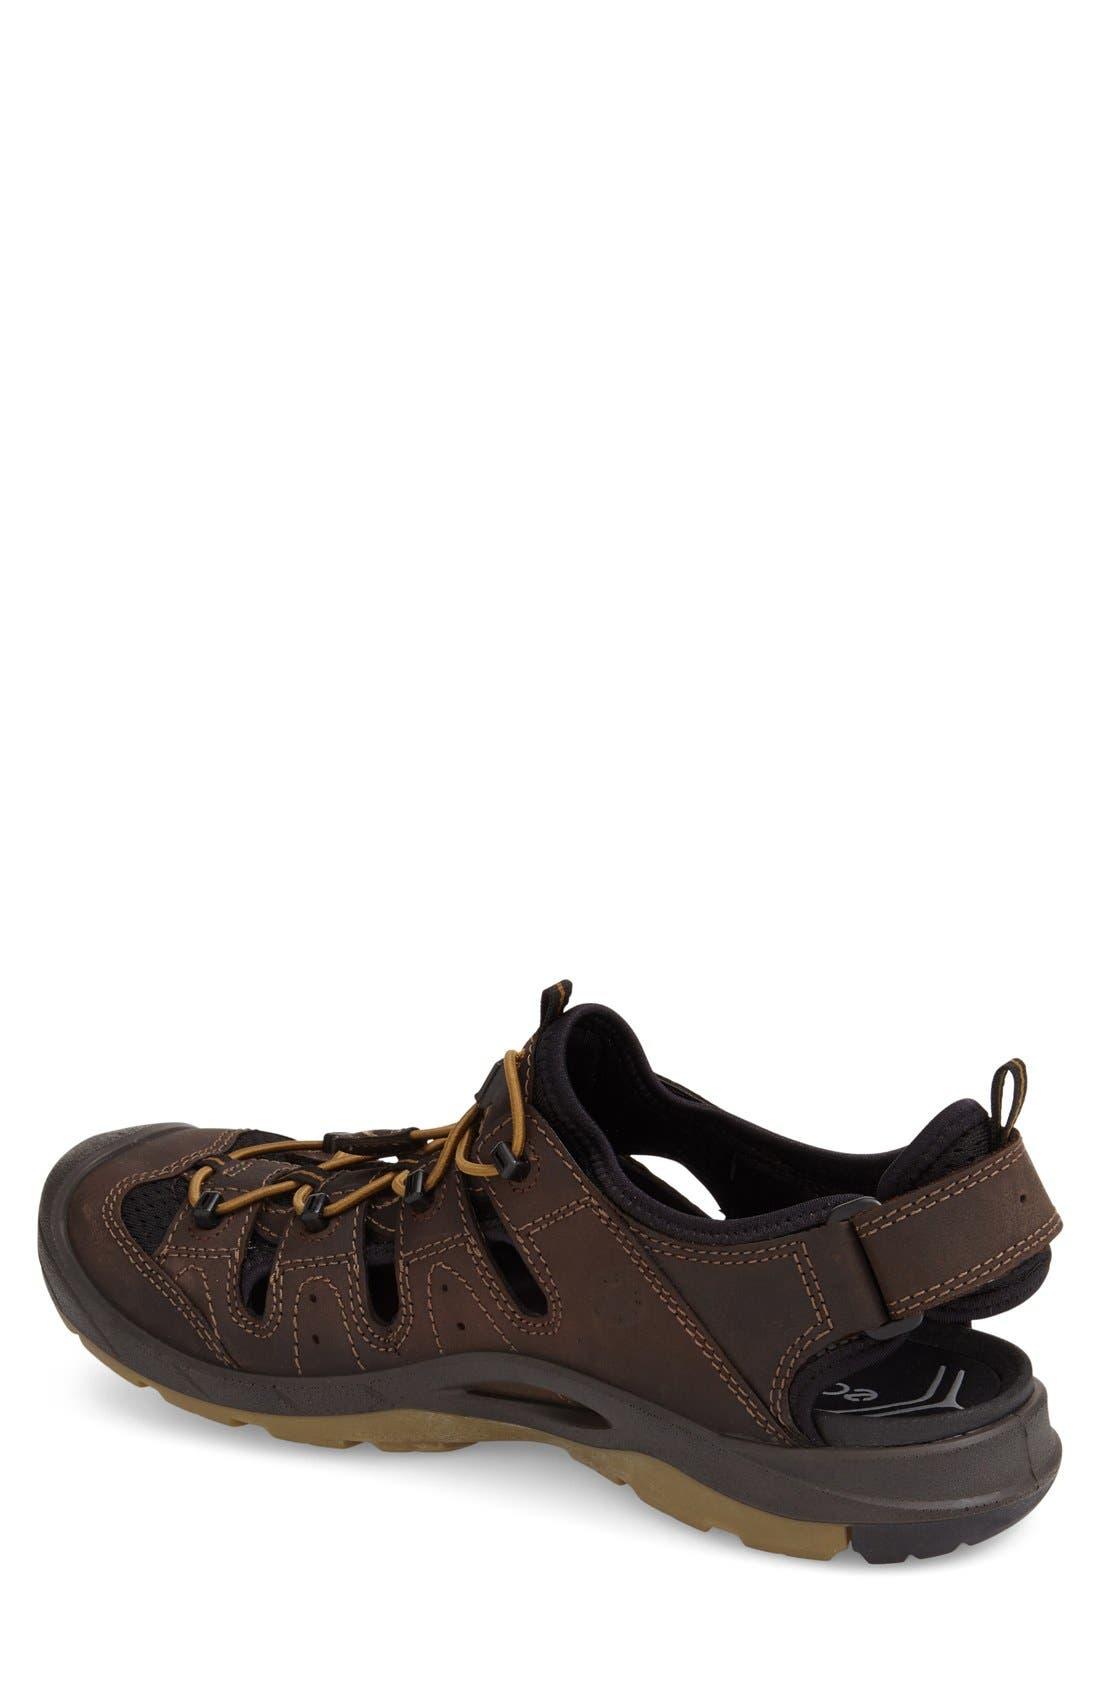 'BIOM Delta Offroad' Sandal,                             Alternate thumbnail 4, color,